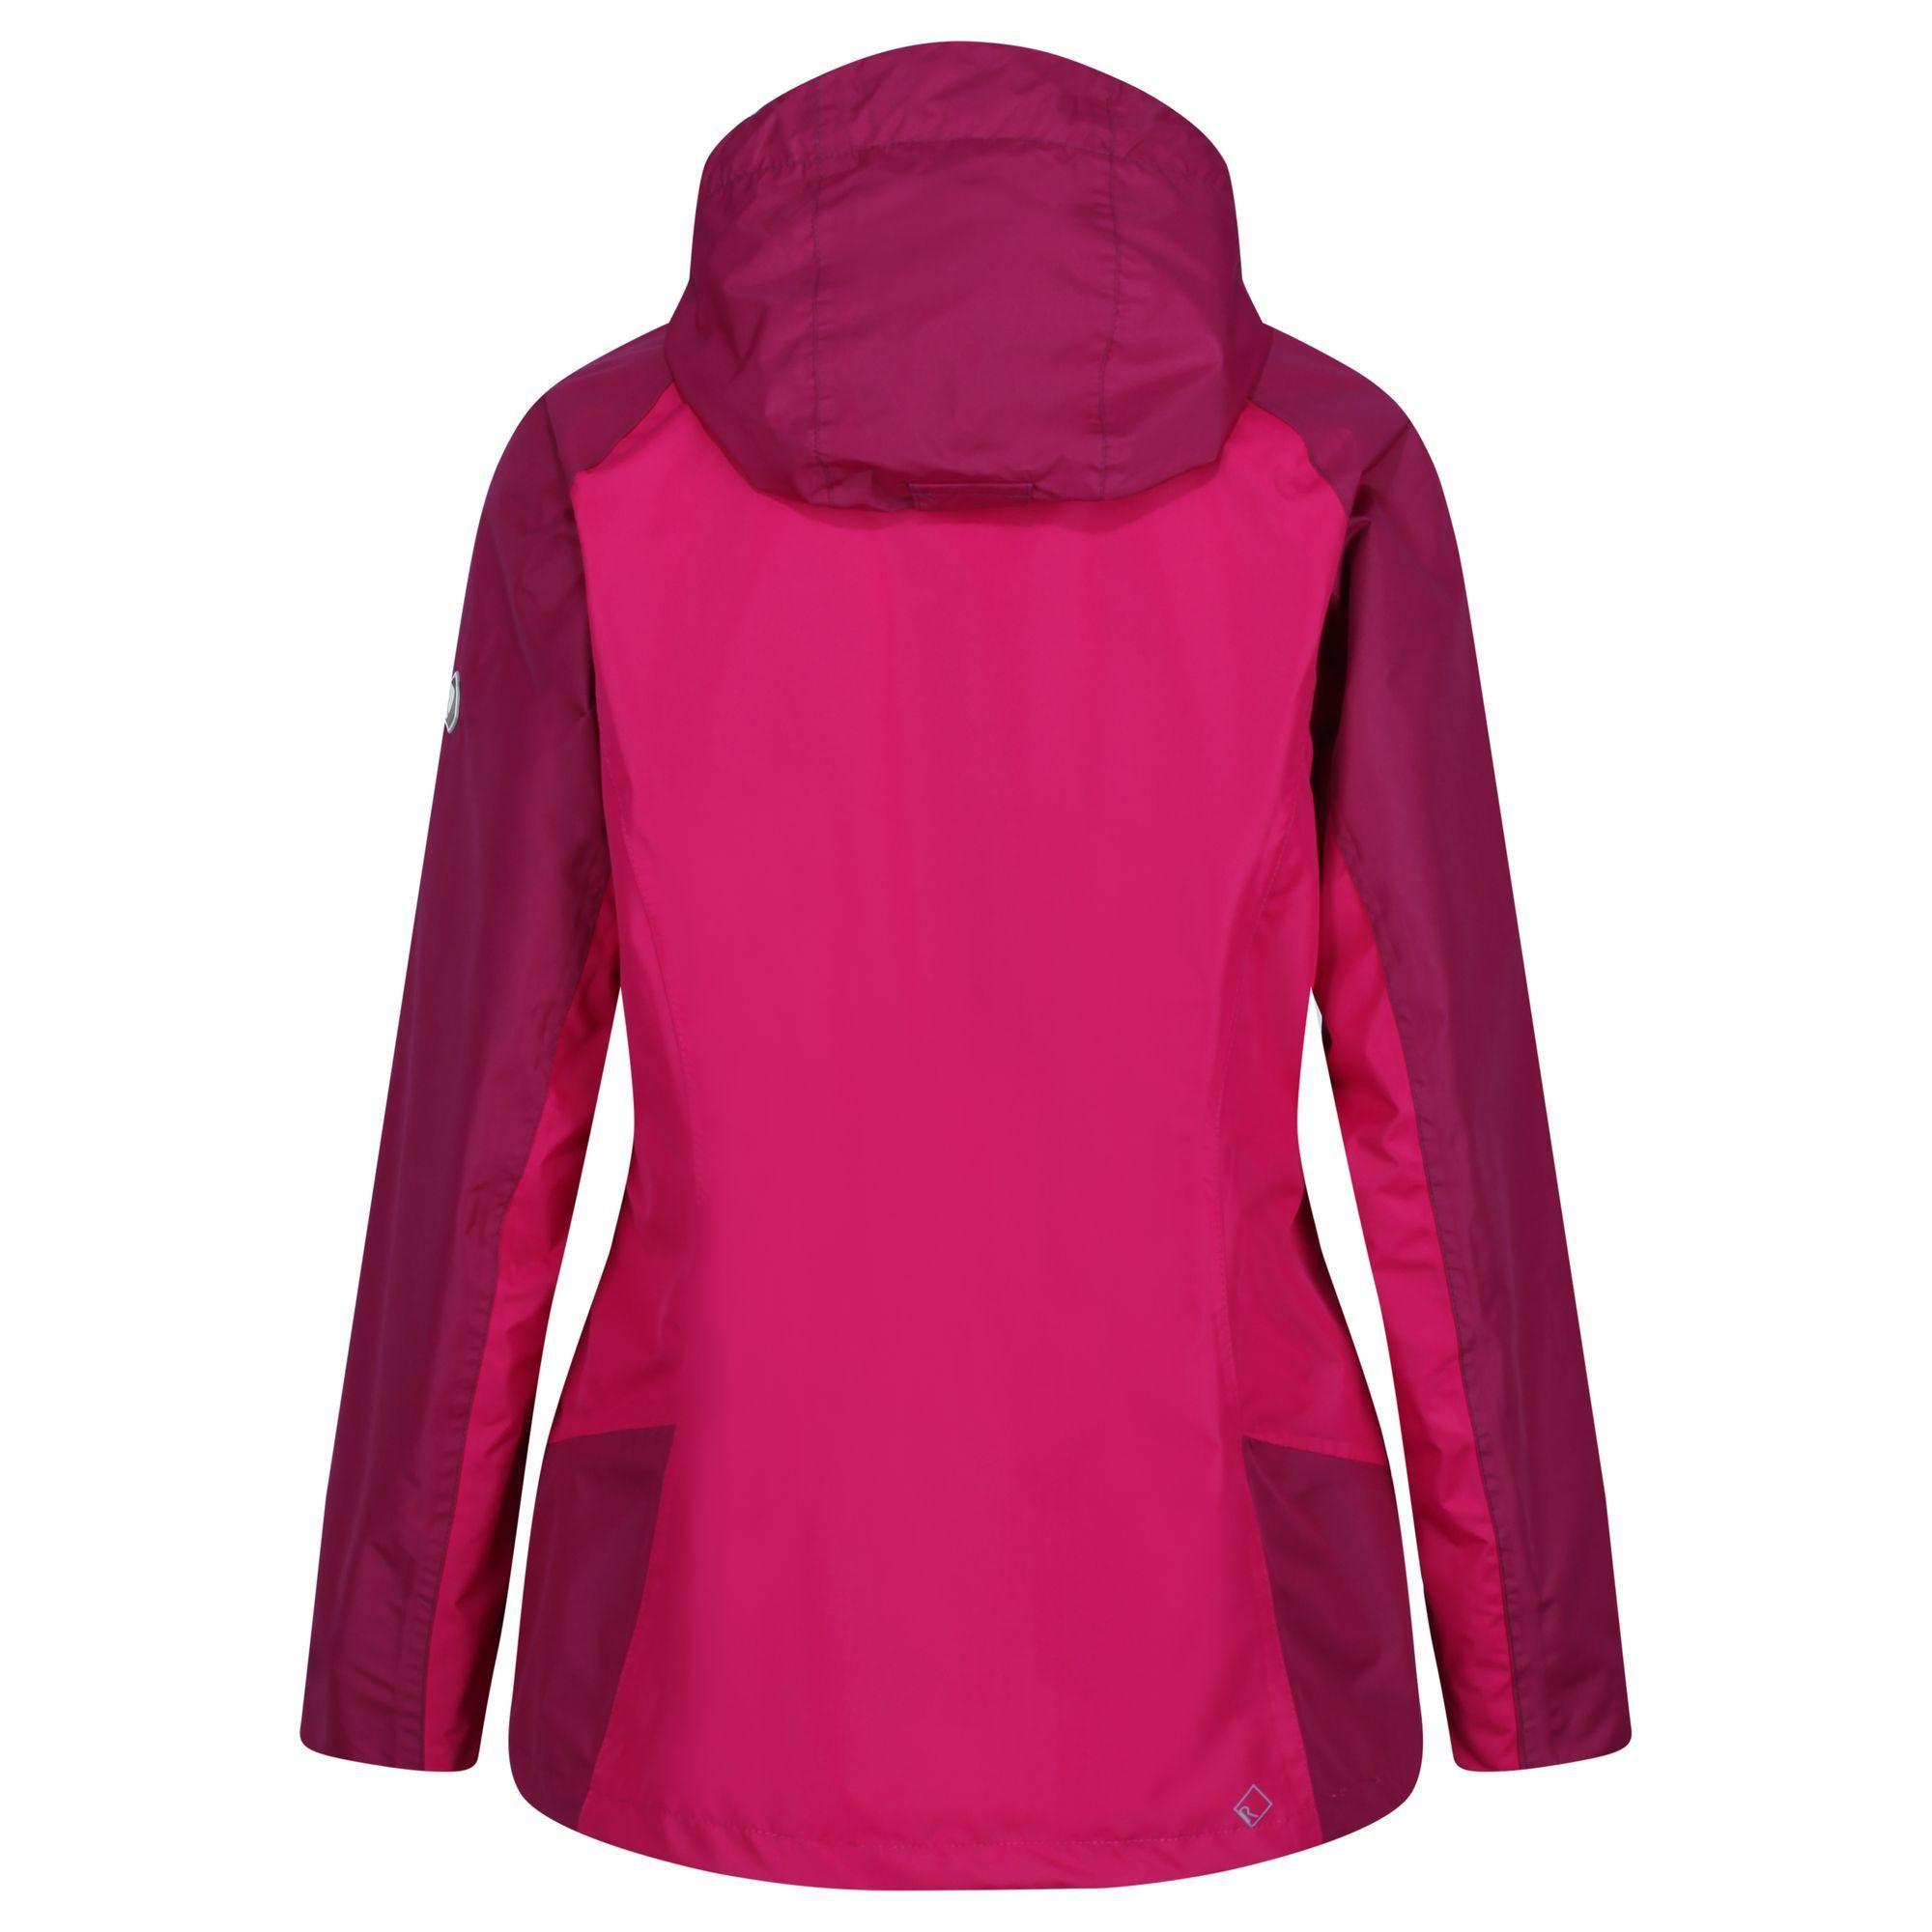 Regatta Women's Calderdale III Lightweight Waterproof Jacket